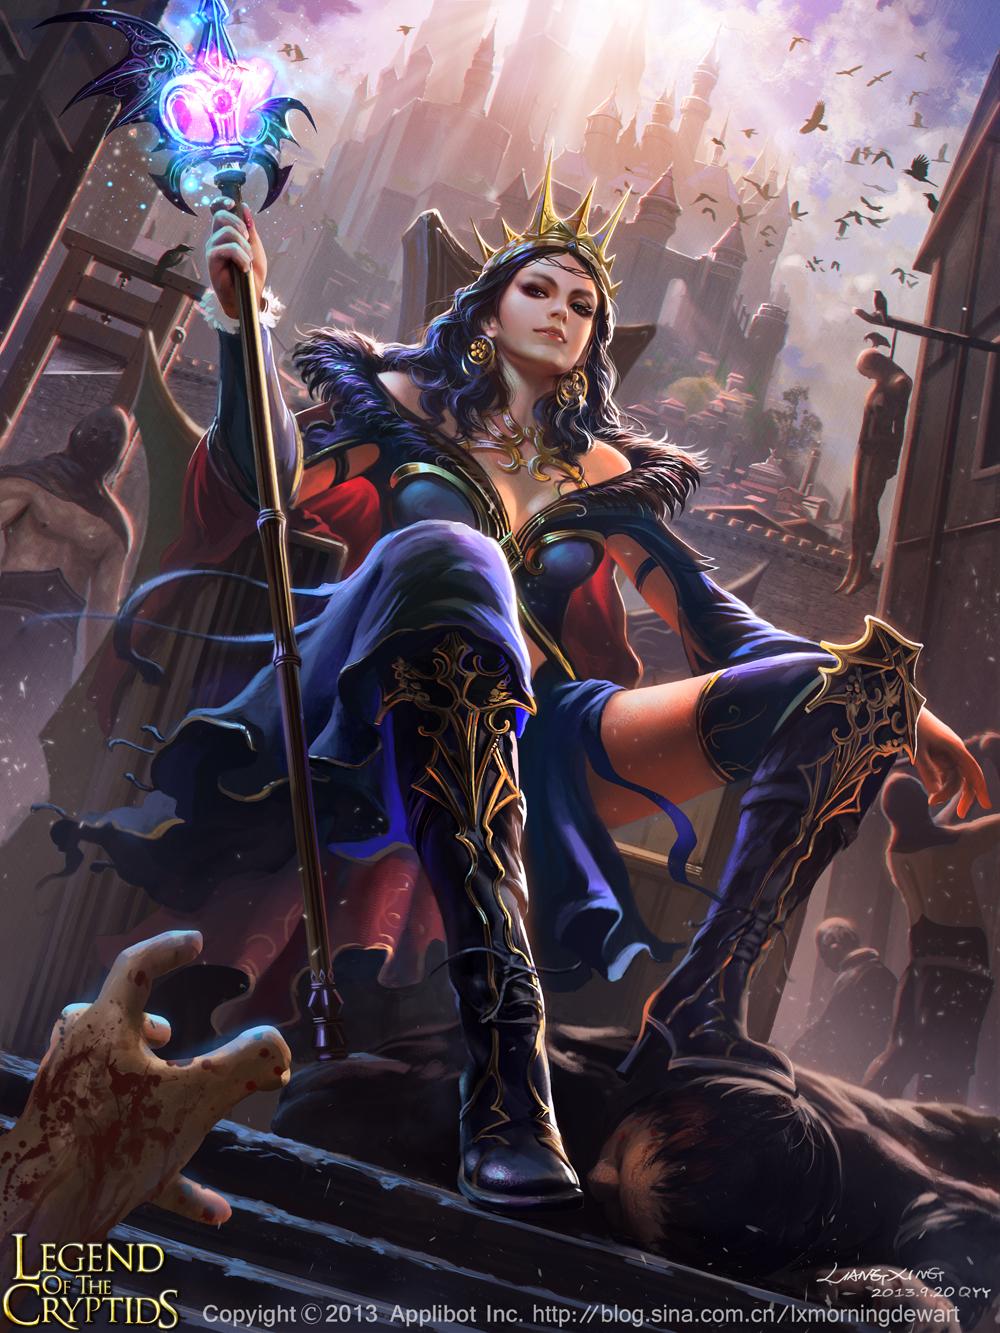 Imperial princess 2 by liangxinxin